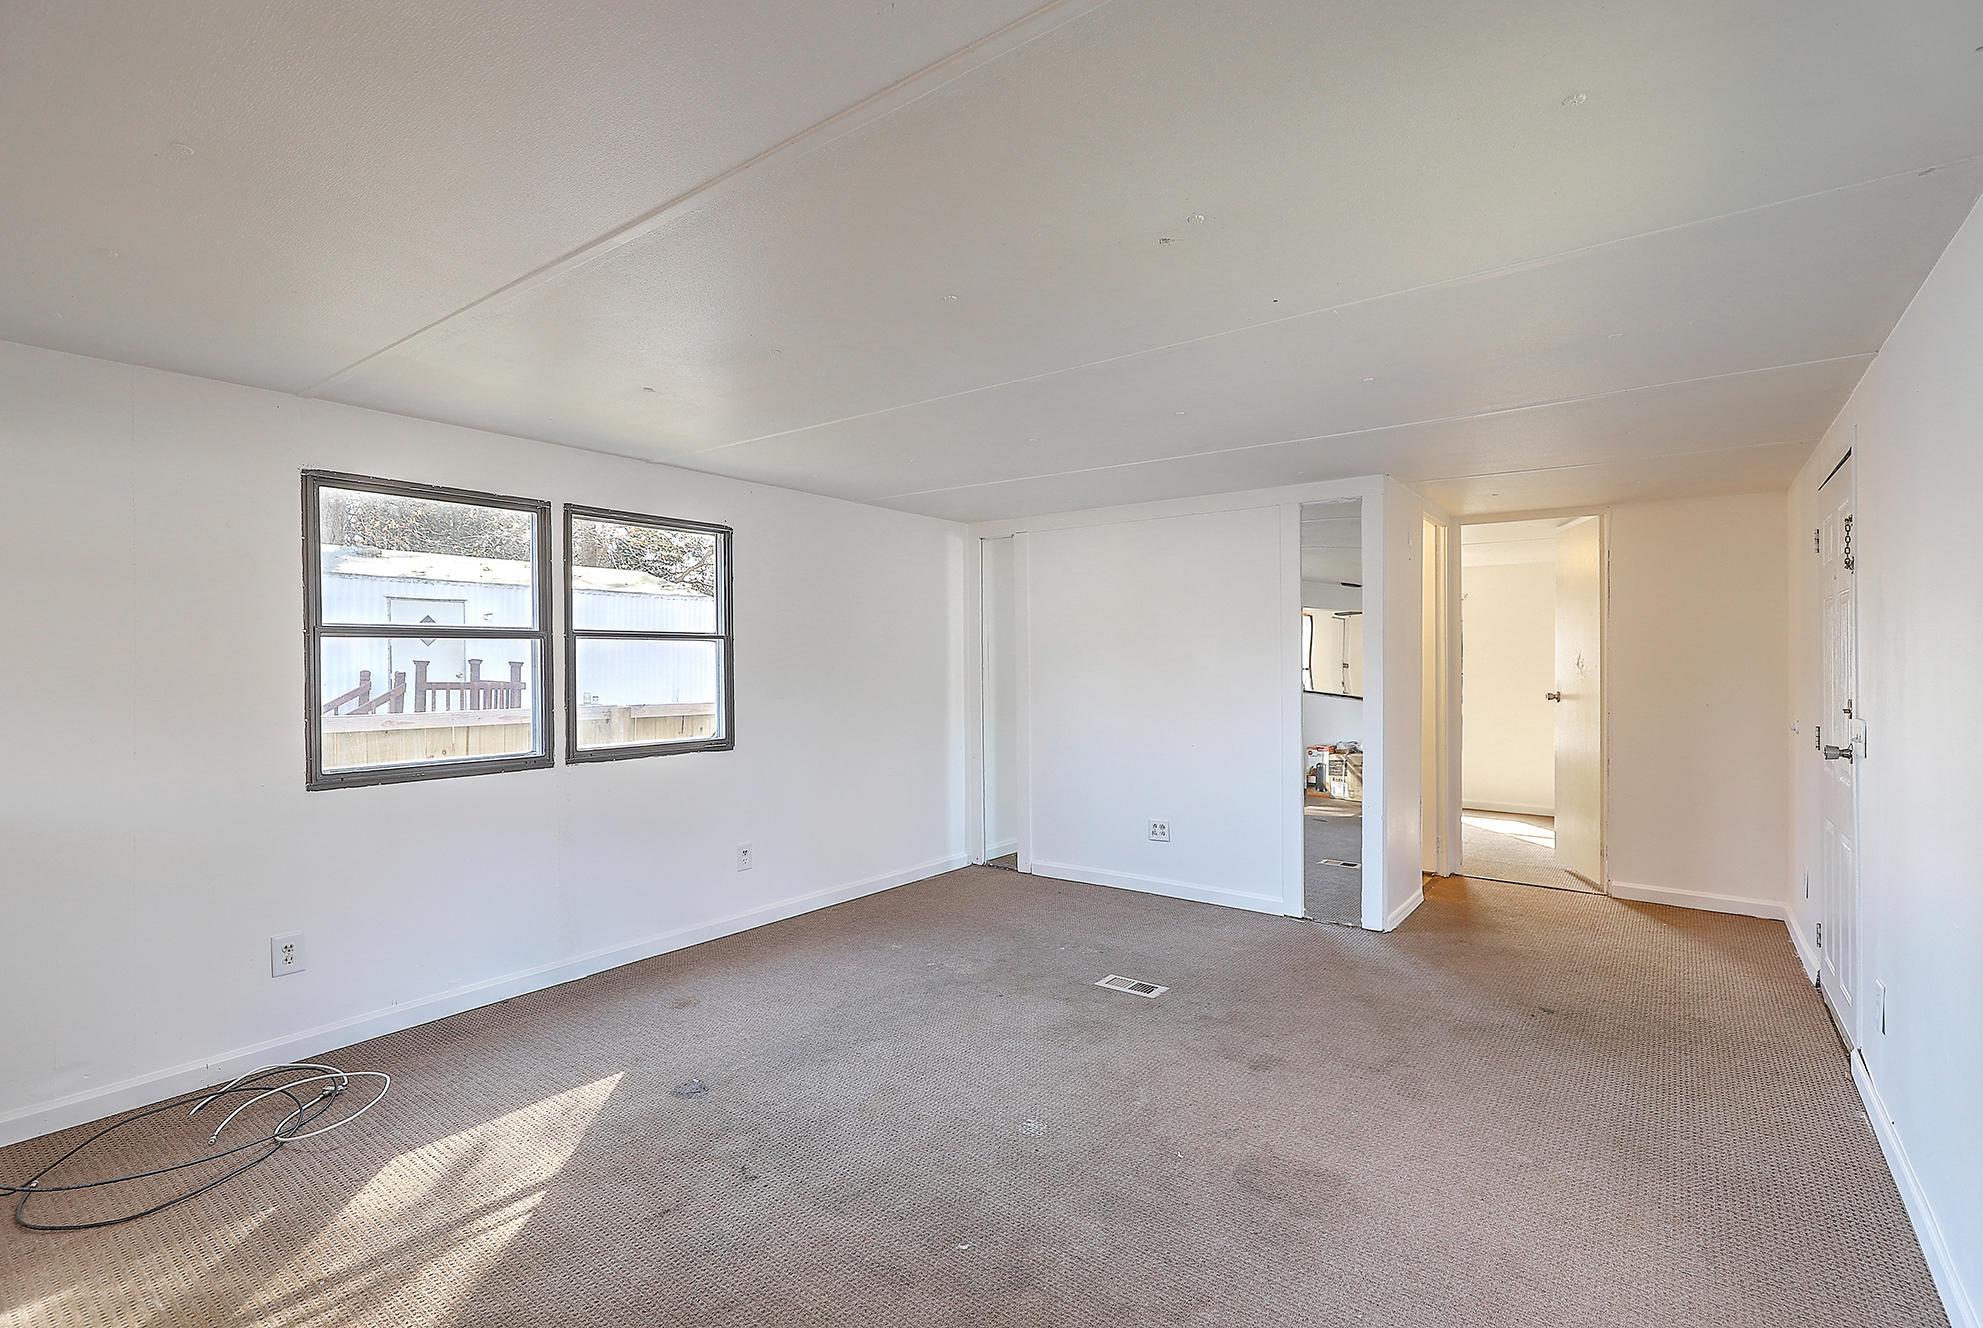 Caromi Village Homes For Sale - 323 Raymond, Ladson, SC - 4